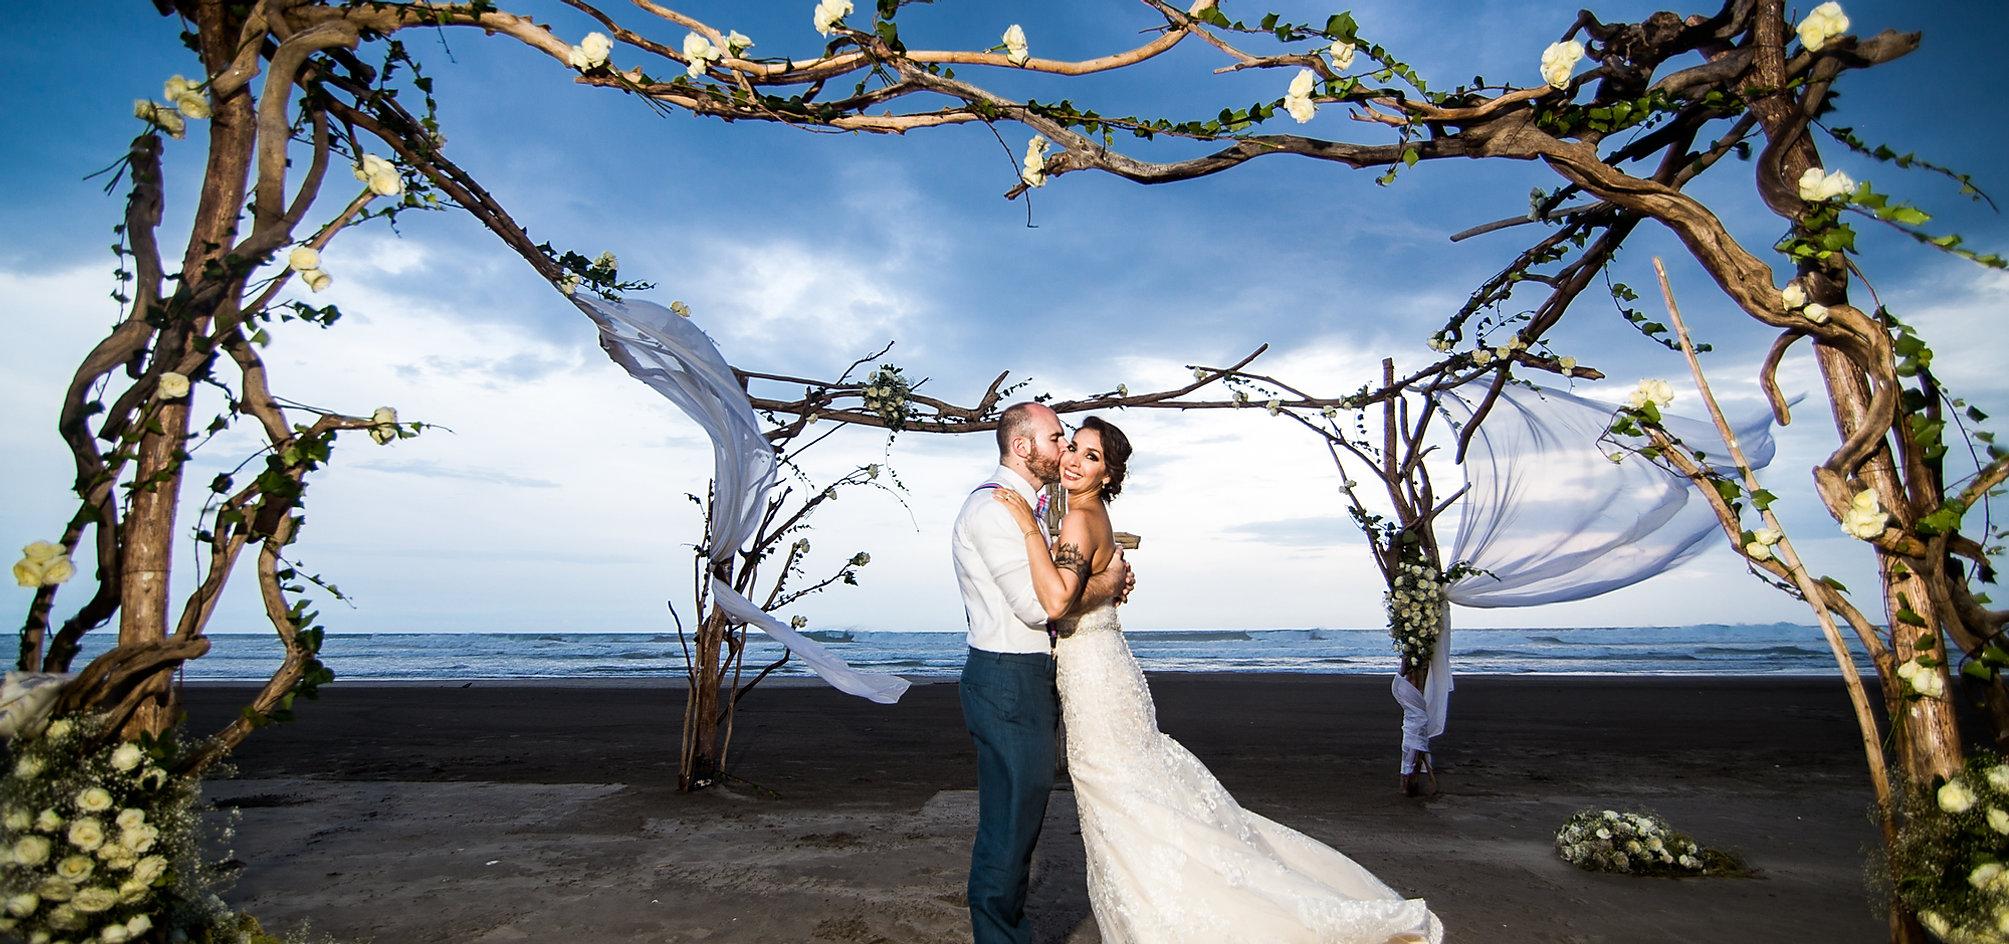 AnaC+Javier-Wedding-LD-834.jpg